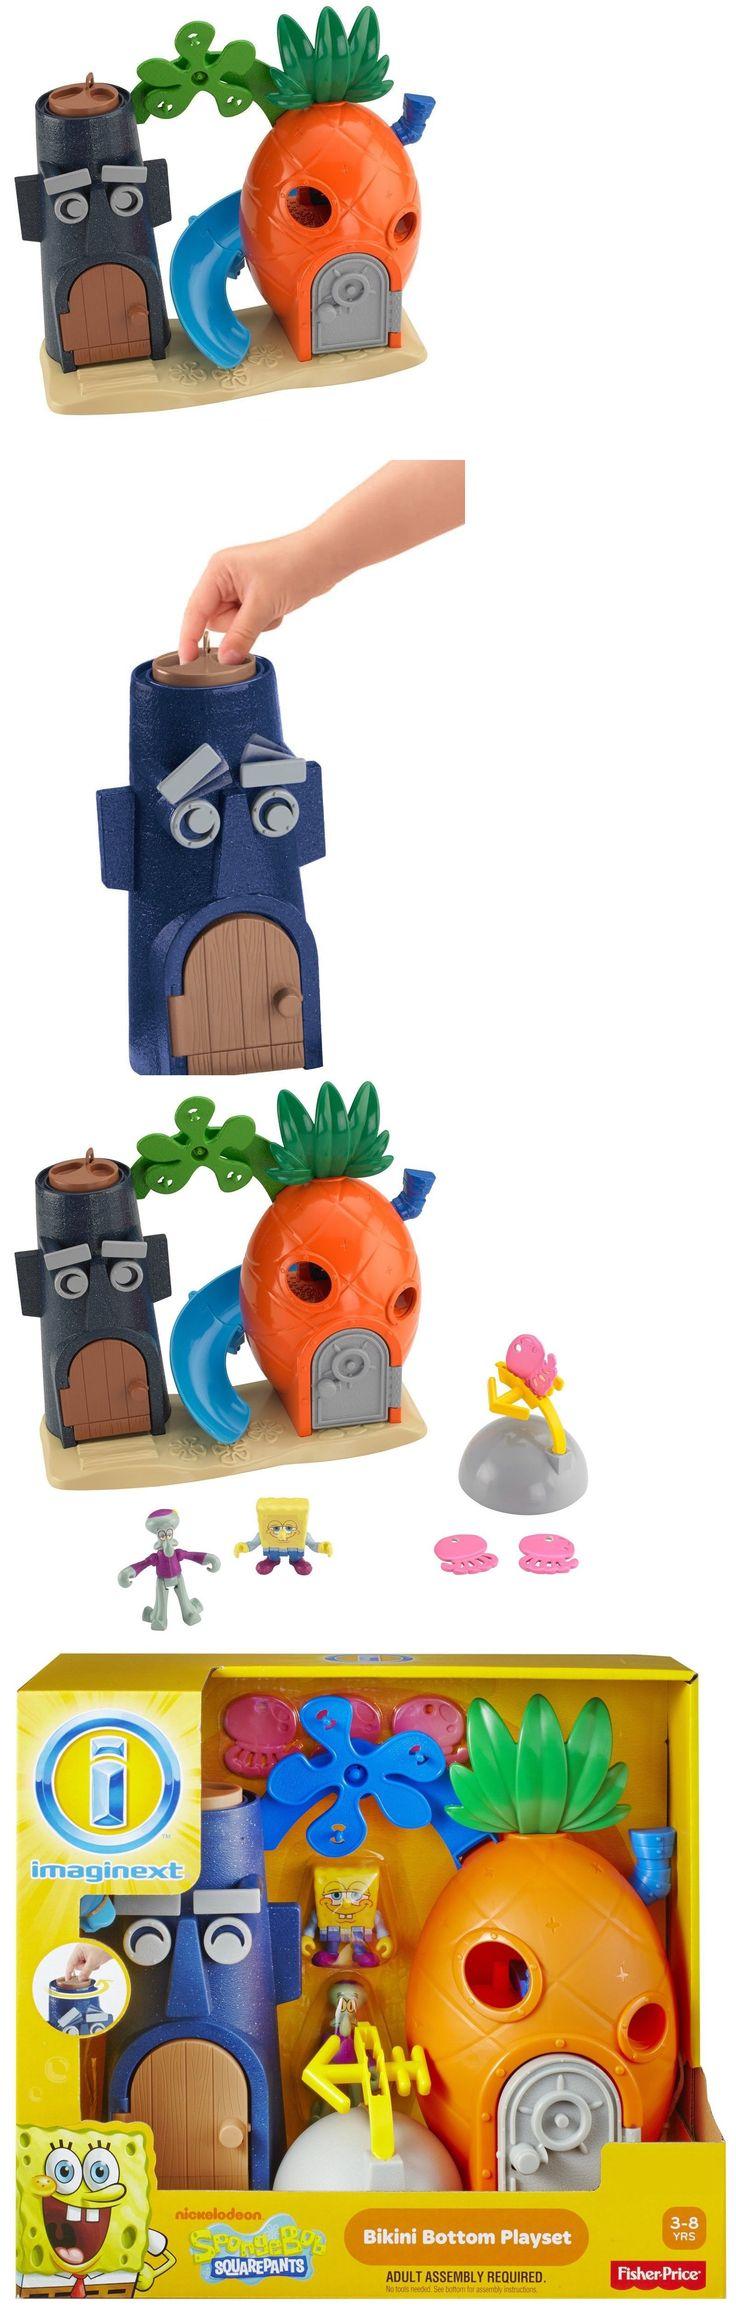 498 best spongebob squarepants 20919 images on pinterest